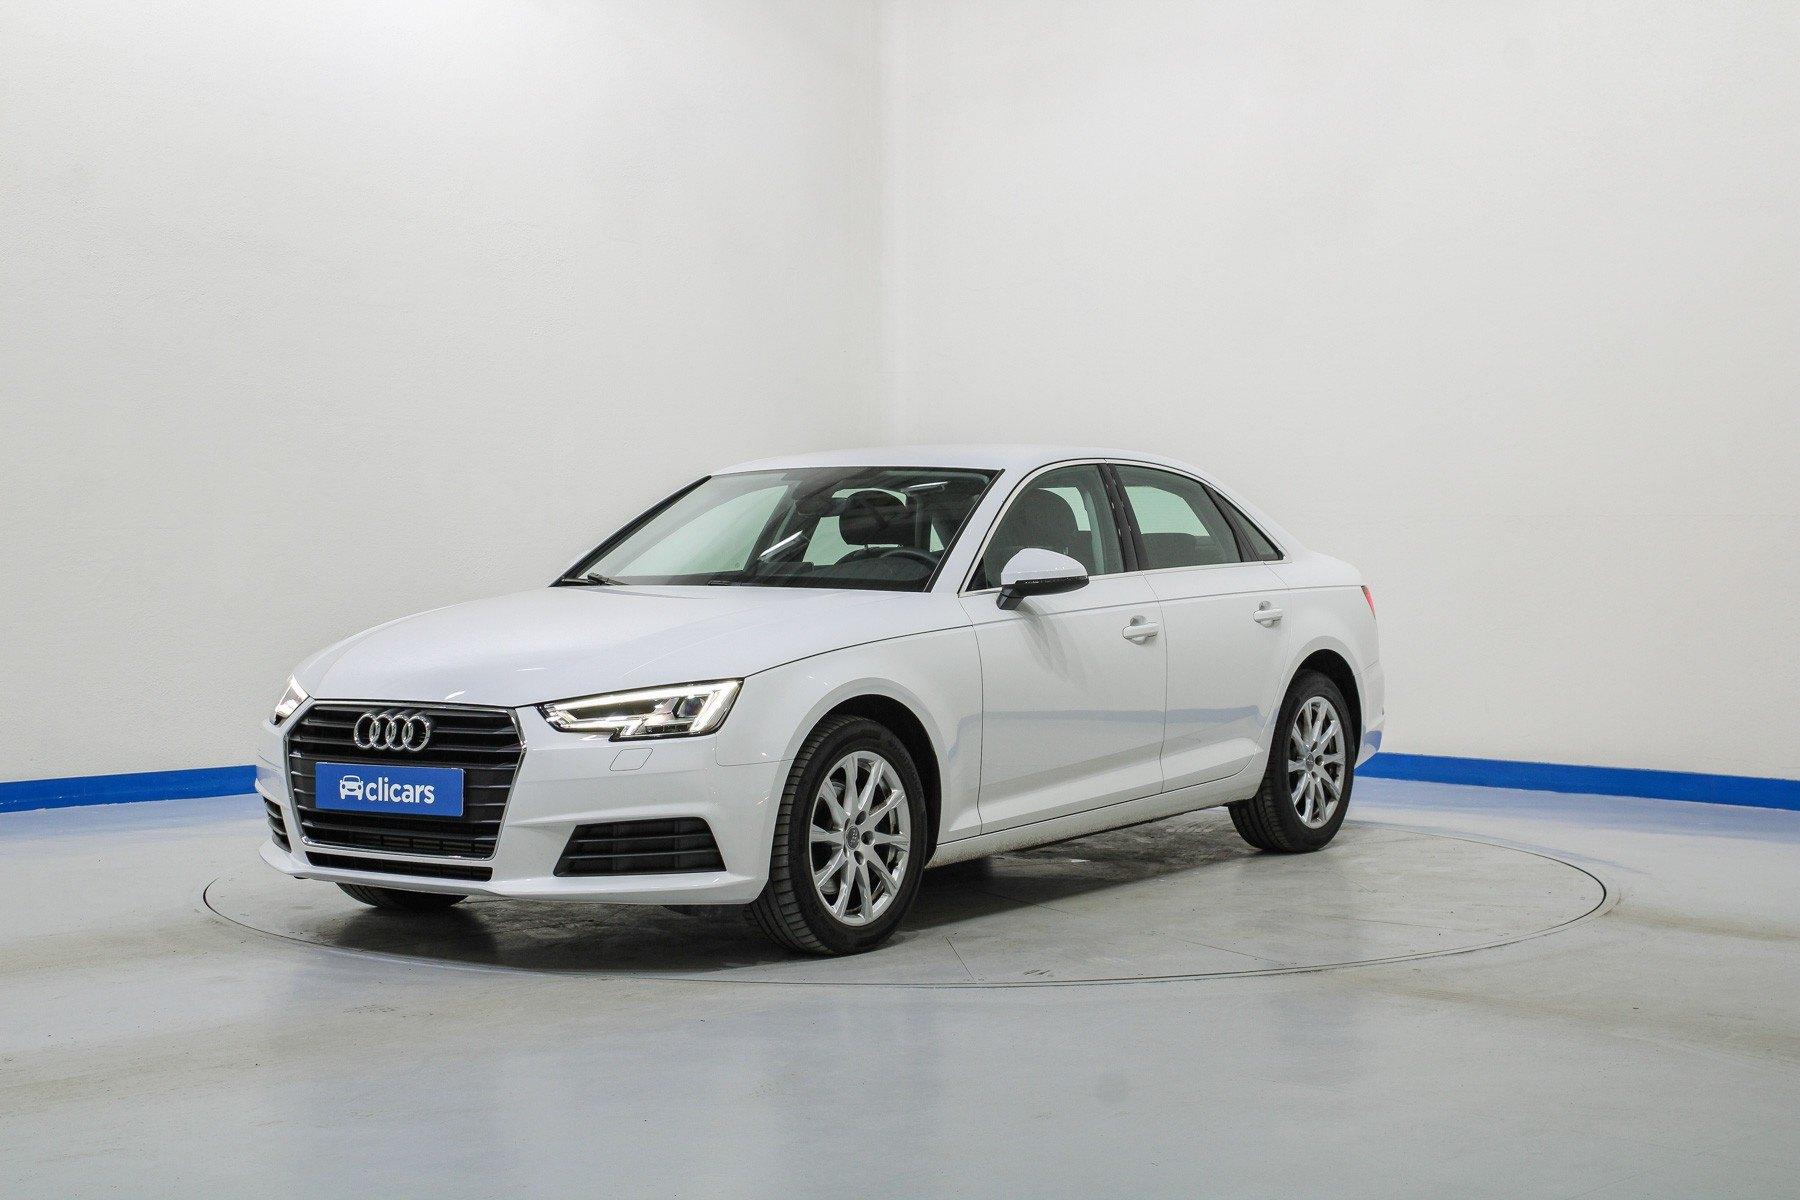 Audi A4 Híbrido suave Advanced 35 TFSI 110kW (150CV) S tronic 1